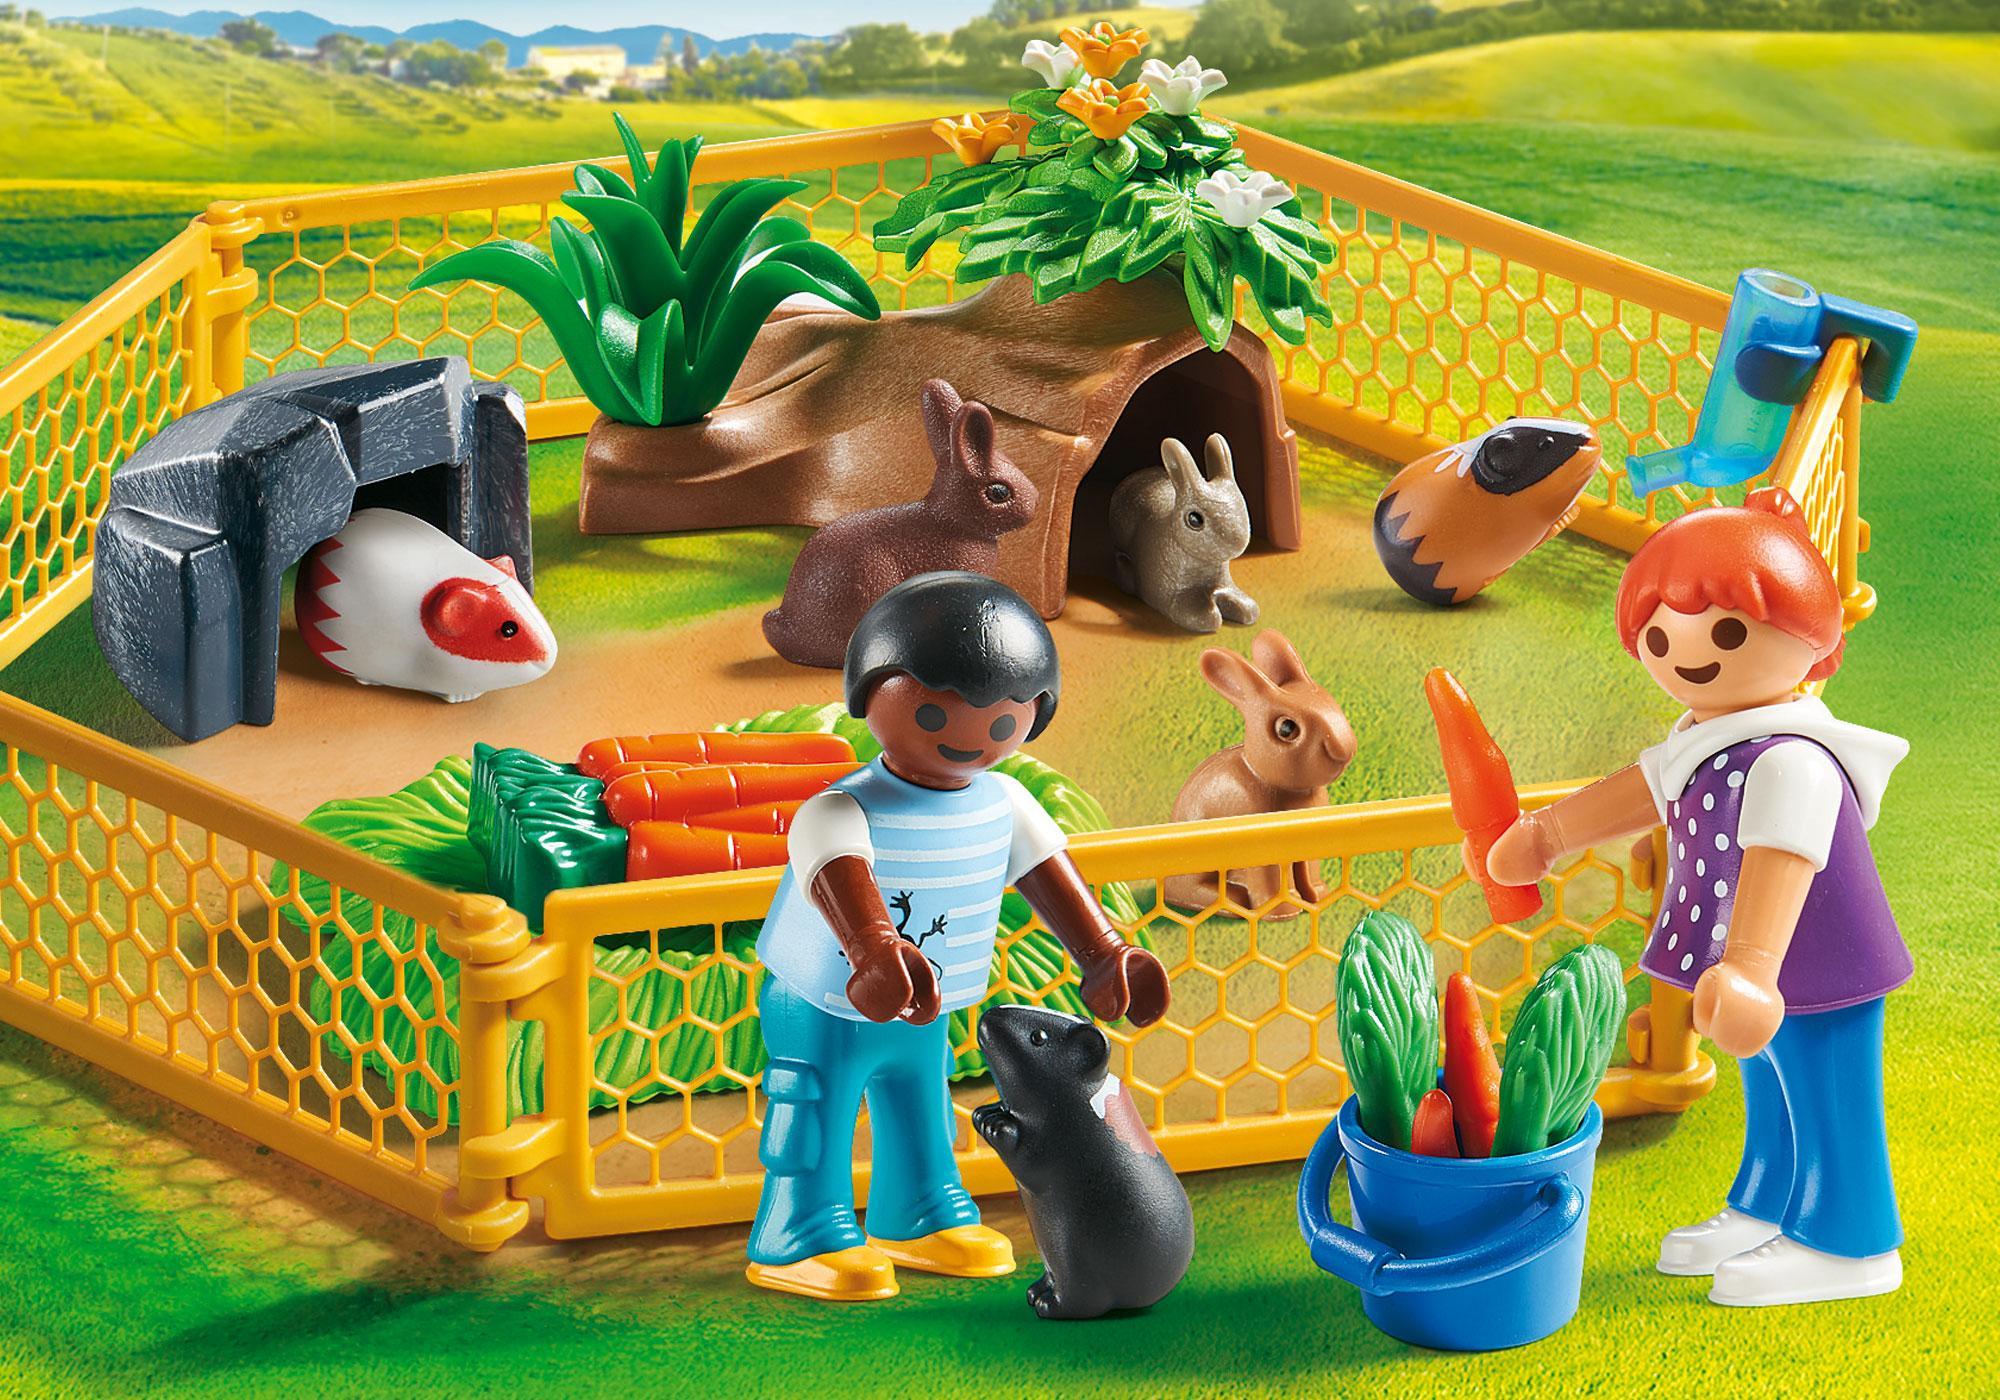 http://media.playmobil.com/i/playmobil/70137_product_detail/Kinderen met kleine dieren